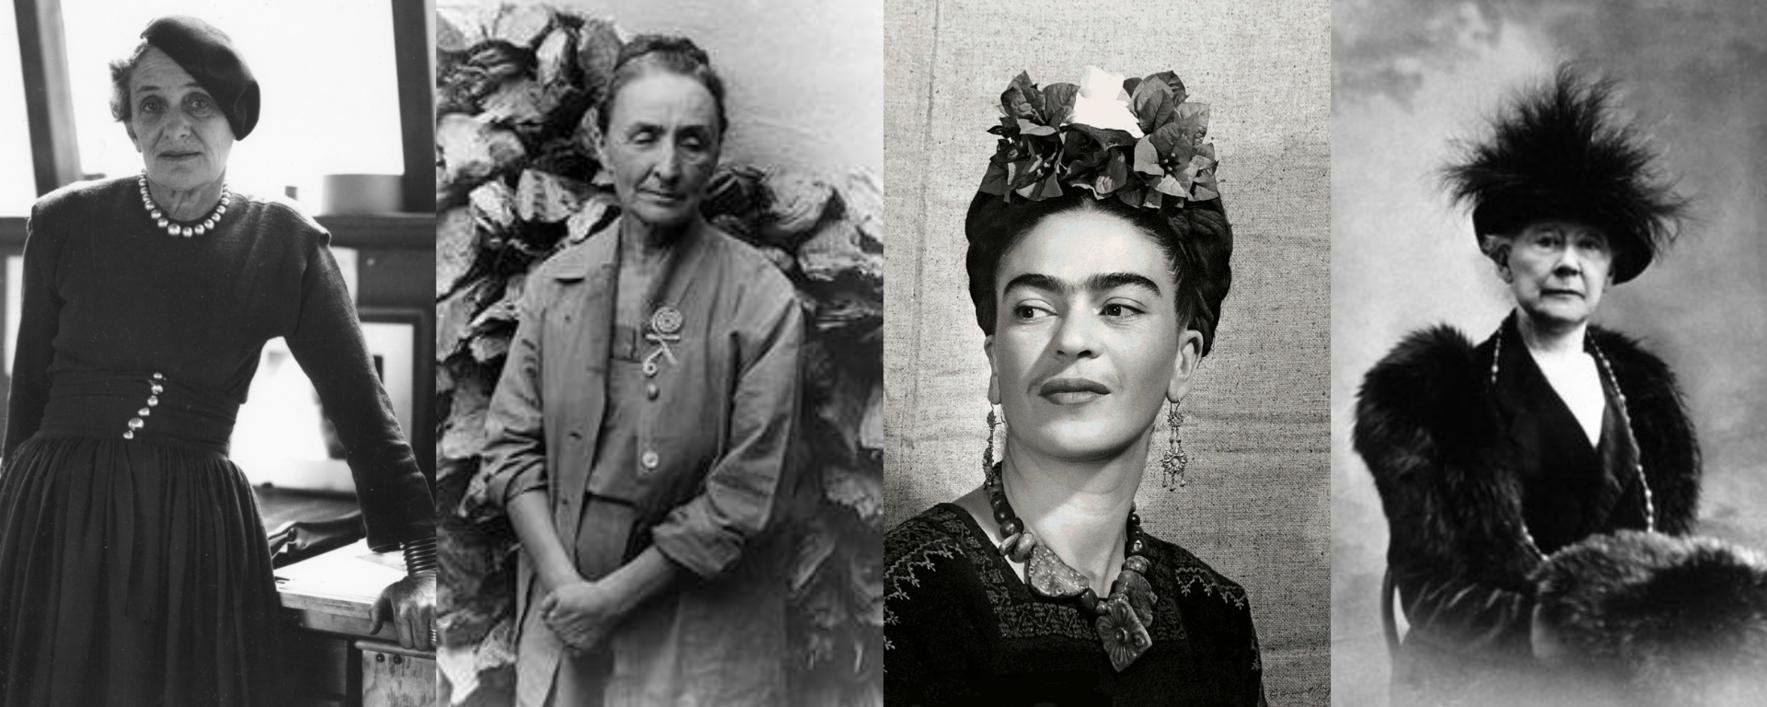 Family Art Club: Women in Art image